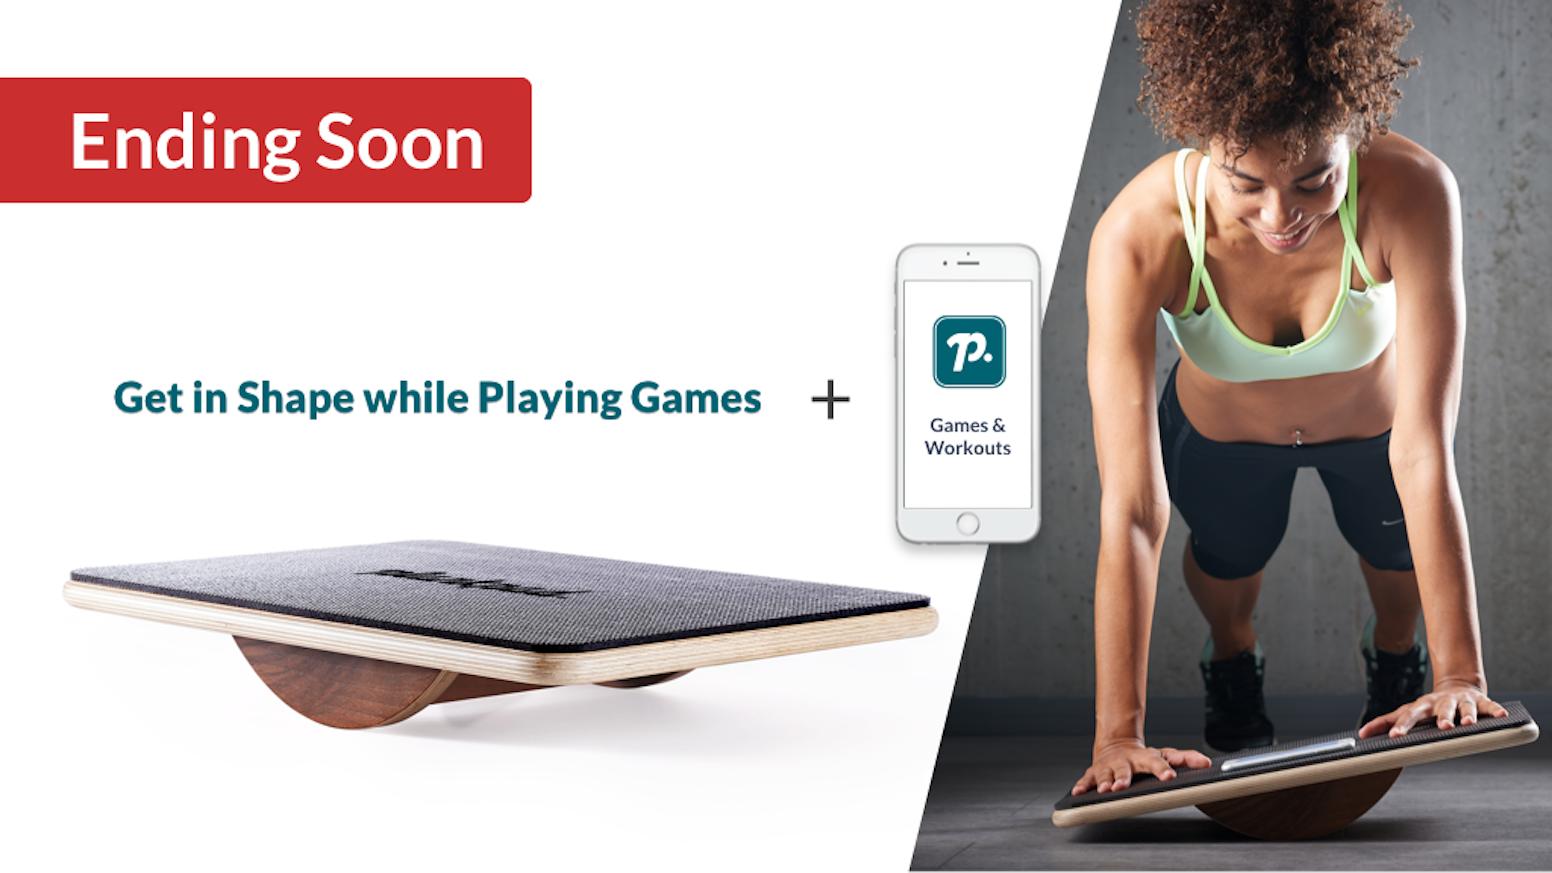 Strong Back, Core et 6-Pack Abs pendant le jeu Passionfruit B.V. – Kickstarter   – abdo